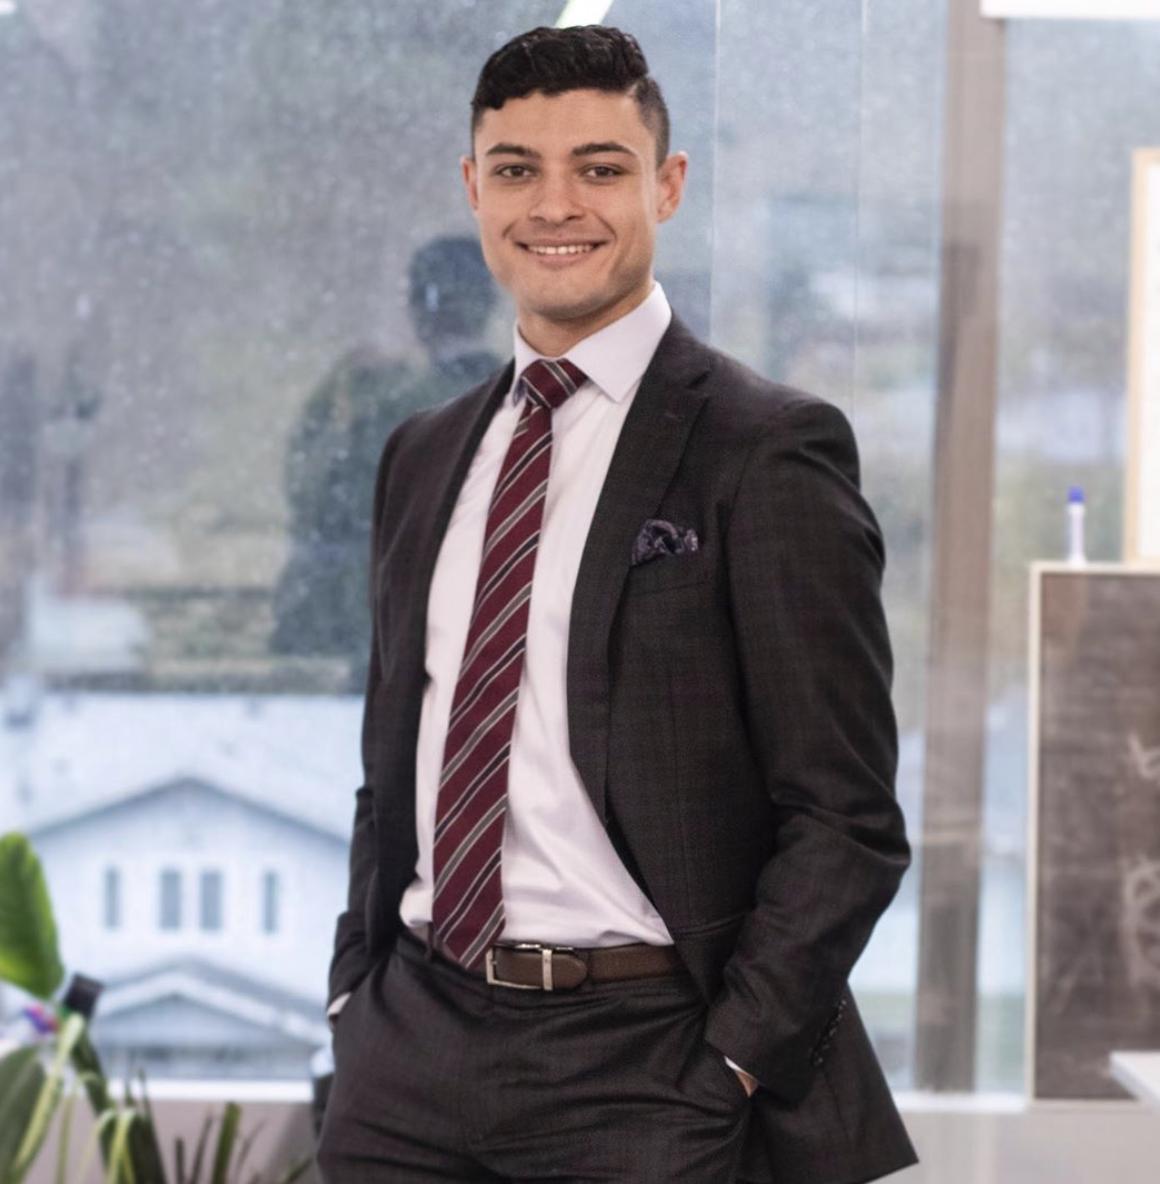 Director of Sales for Grant Cardone Canada - Morgan Walls